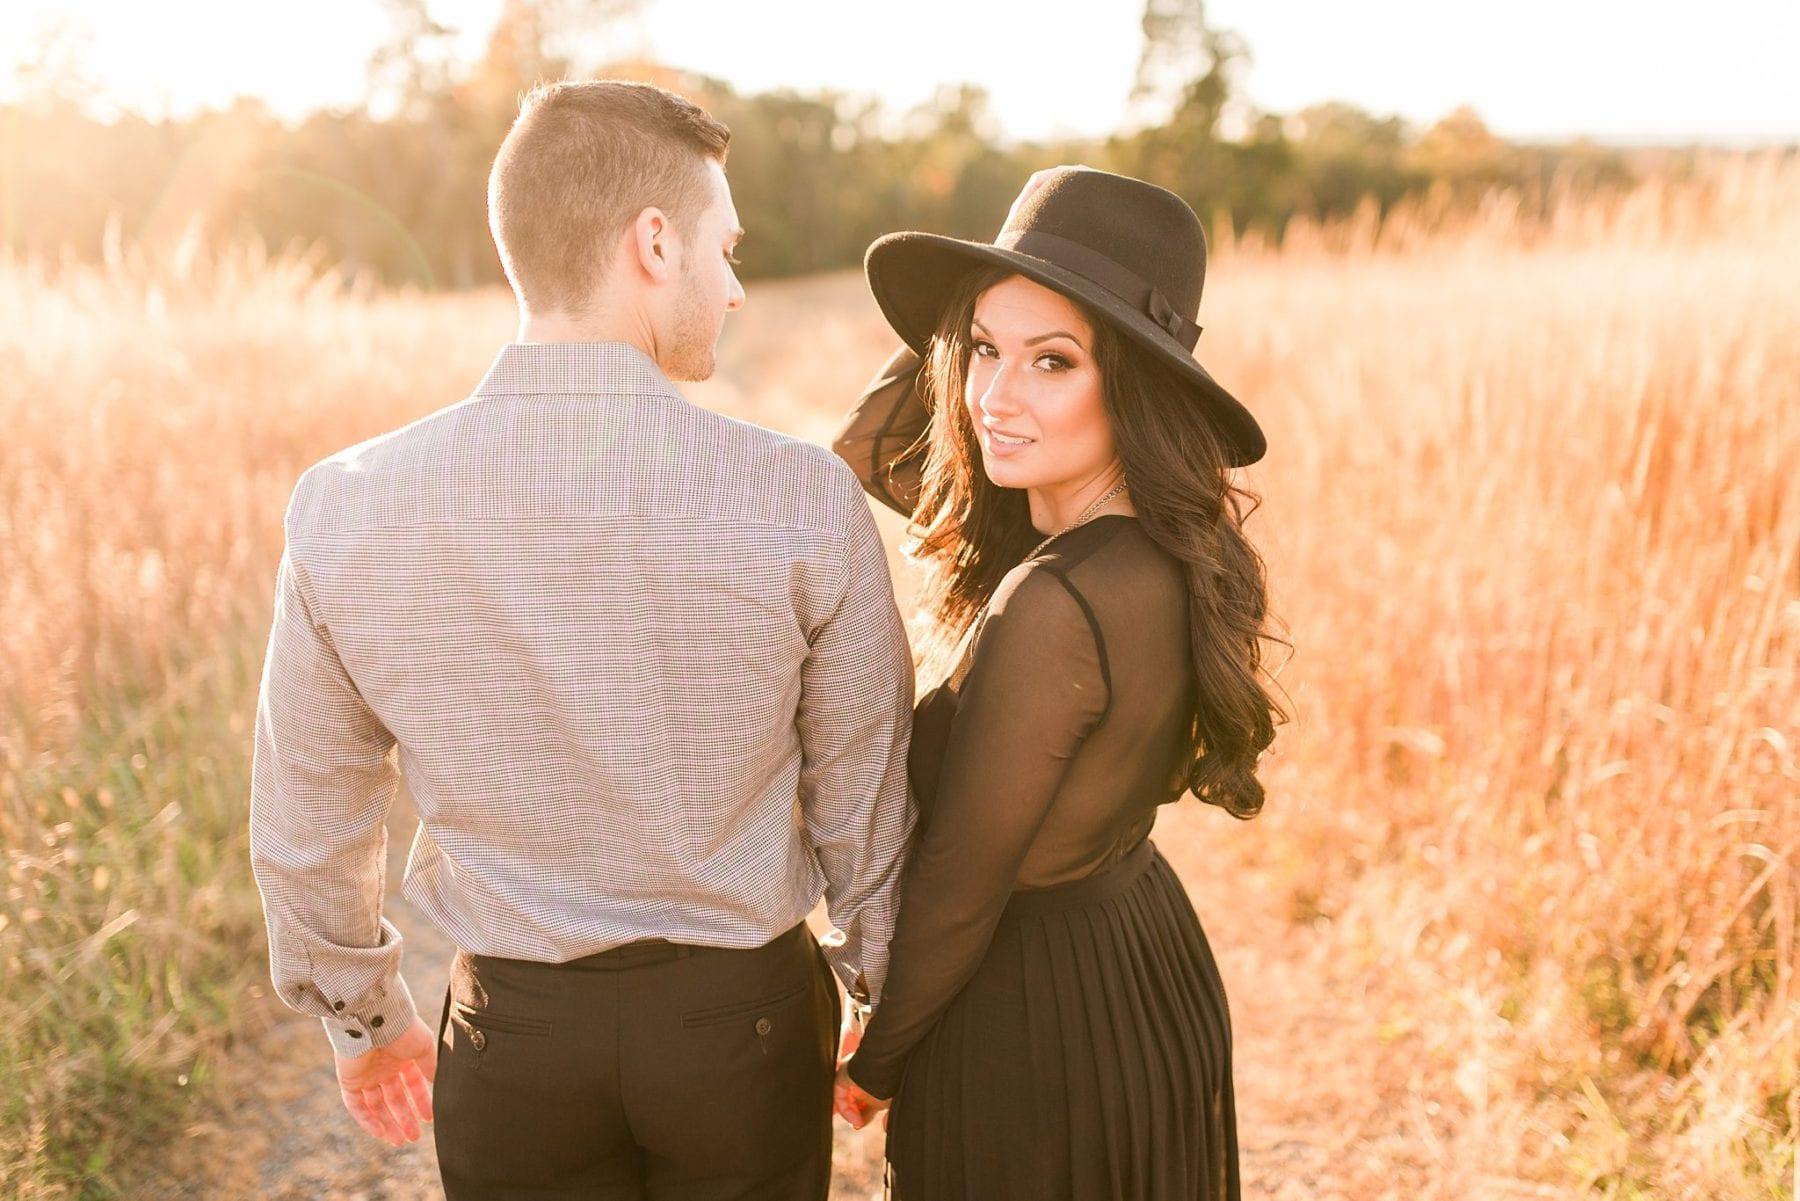 Manassas Battlefield Portraits Virginia Wedding Photographer Megan Kelsey Photography Lianne & Chris-148.jpg